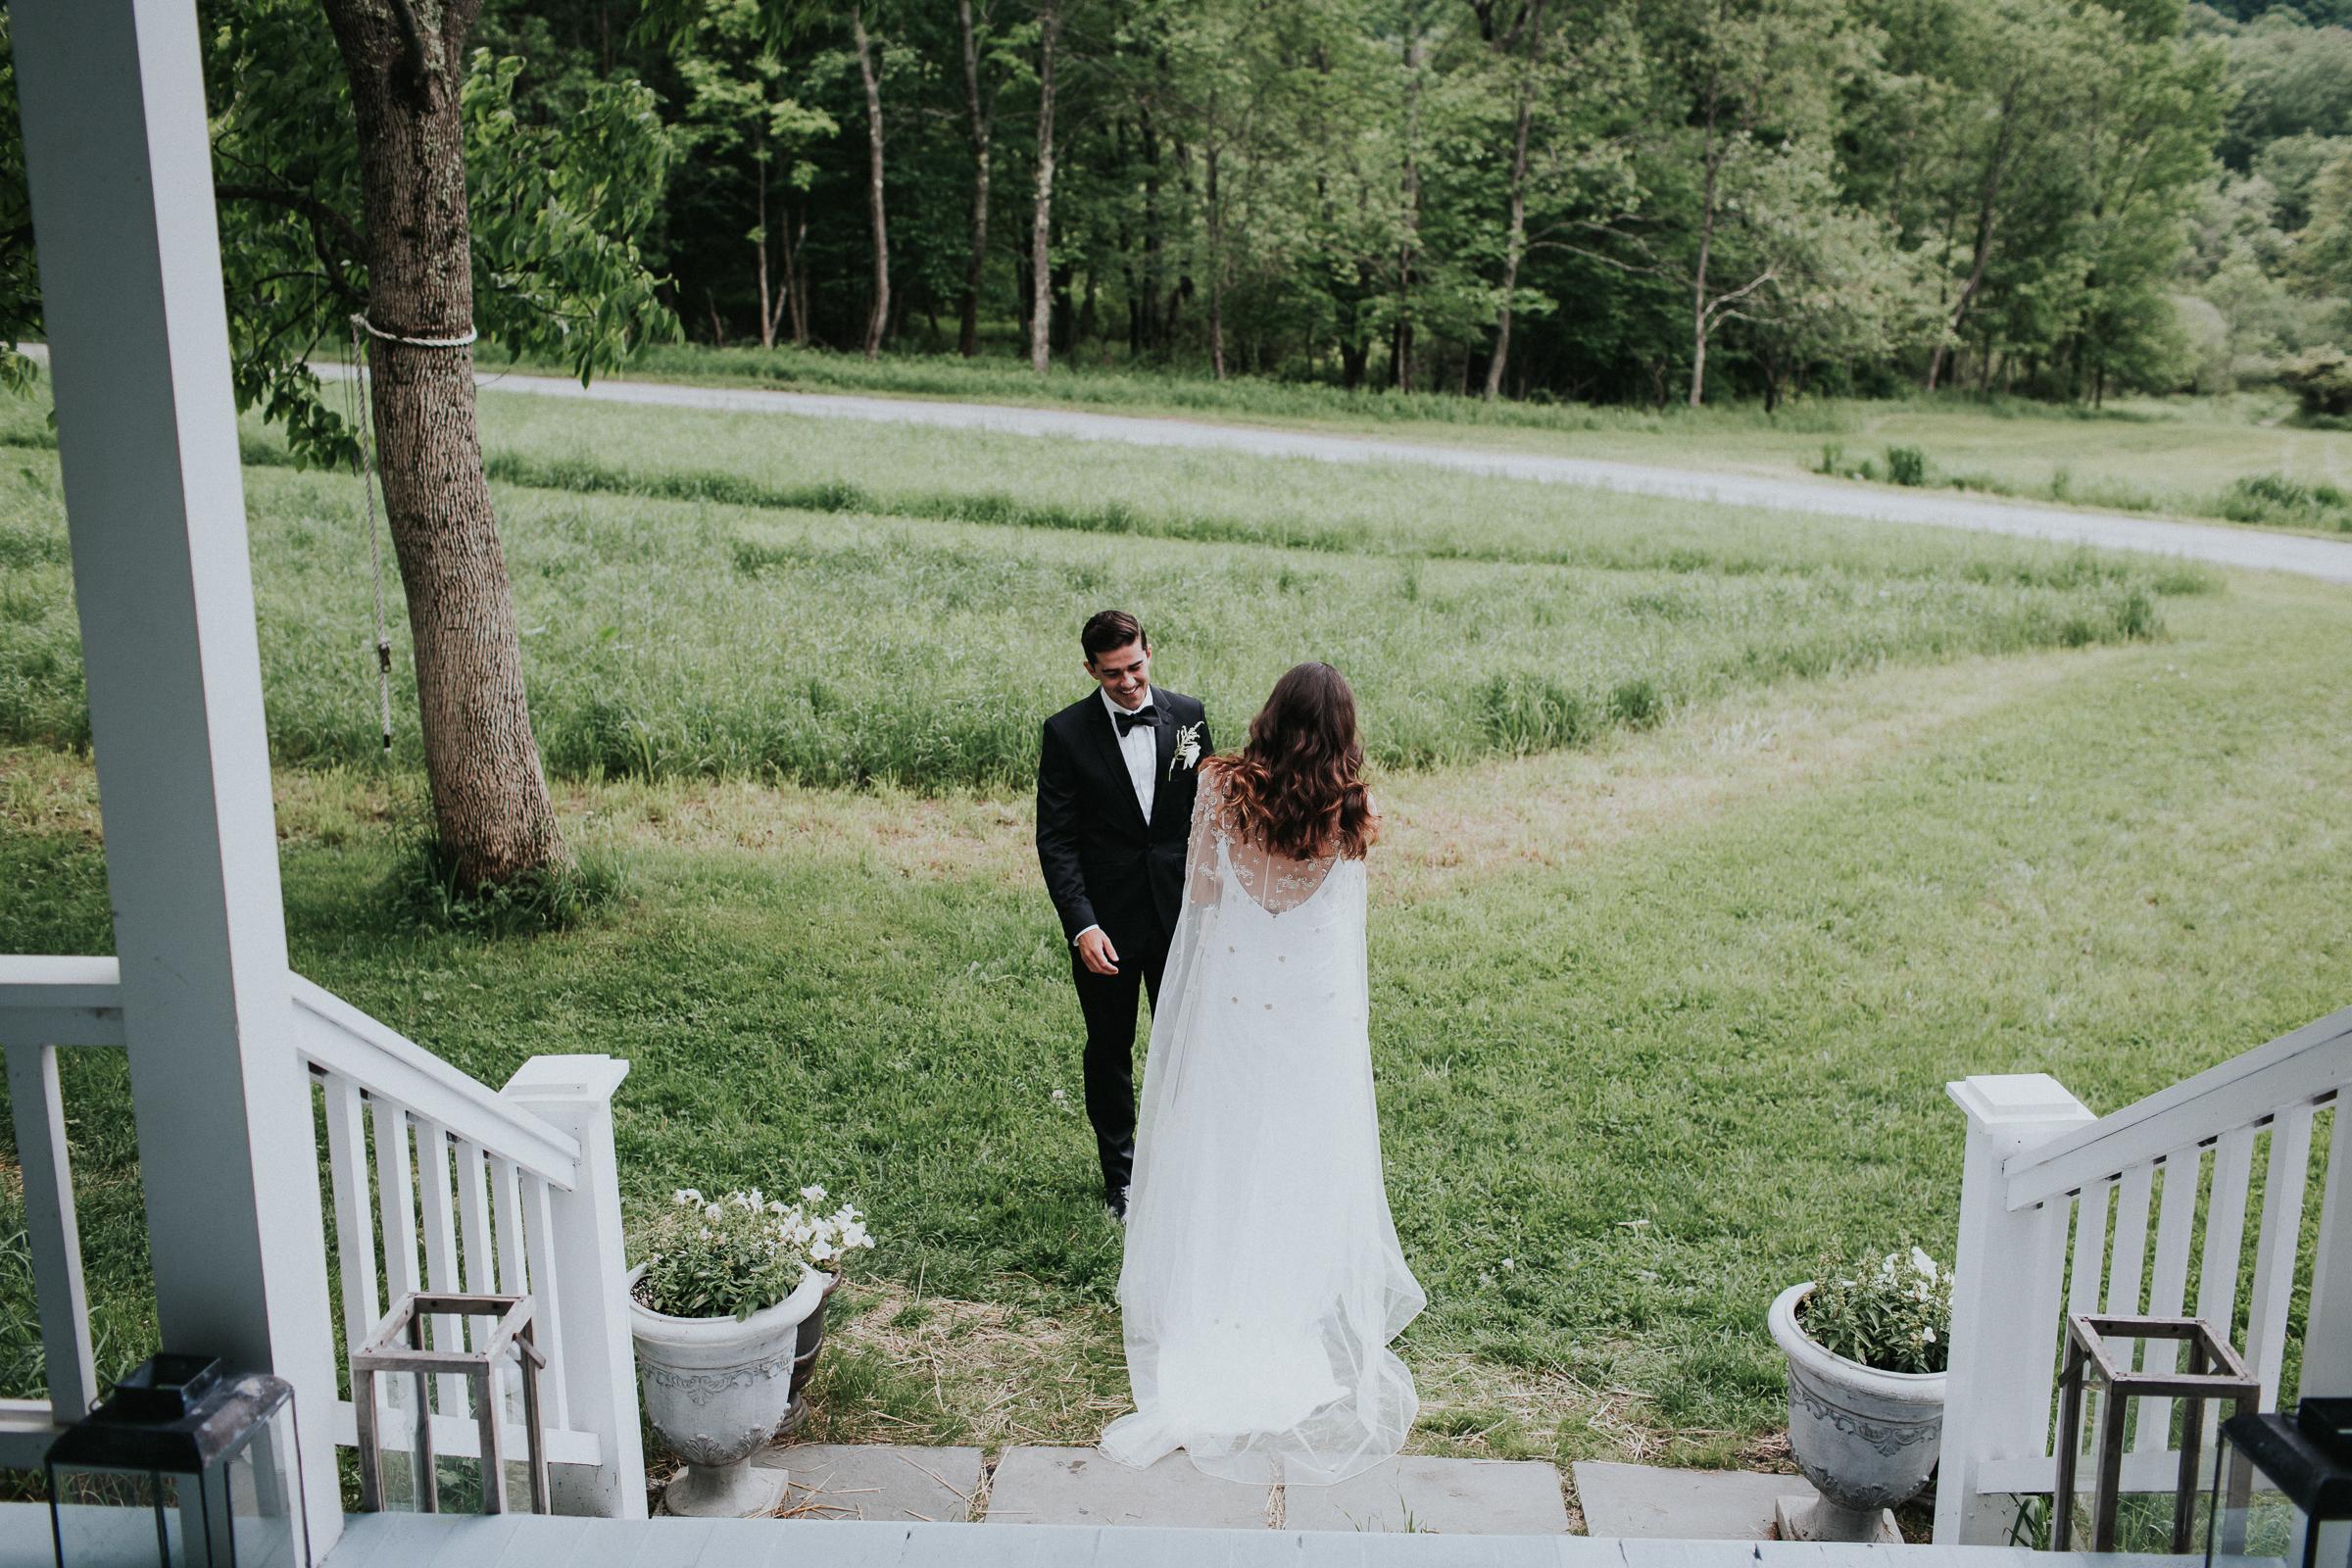 Handsome-Hollow-Long-Eddy-Catskills-New-York-Fine-Art-Documentary-Wedding-Photographer-31.jpg